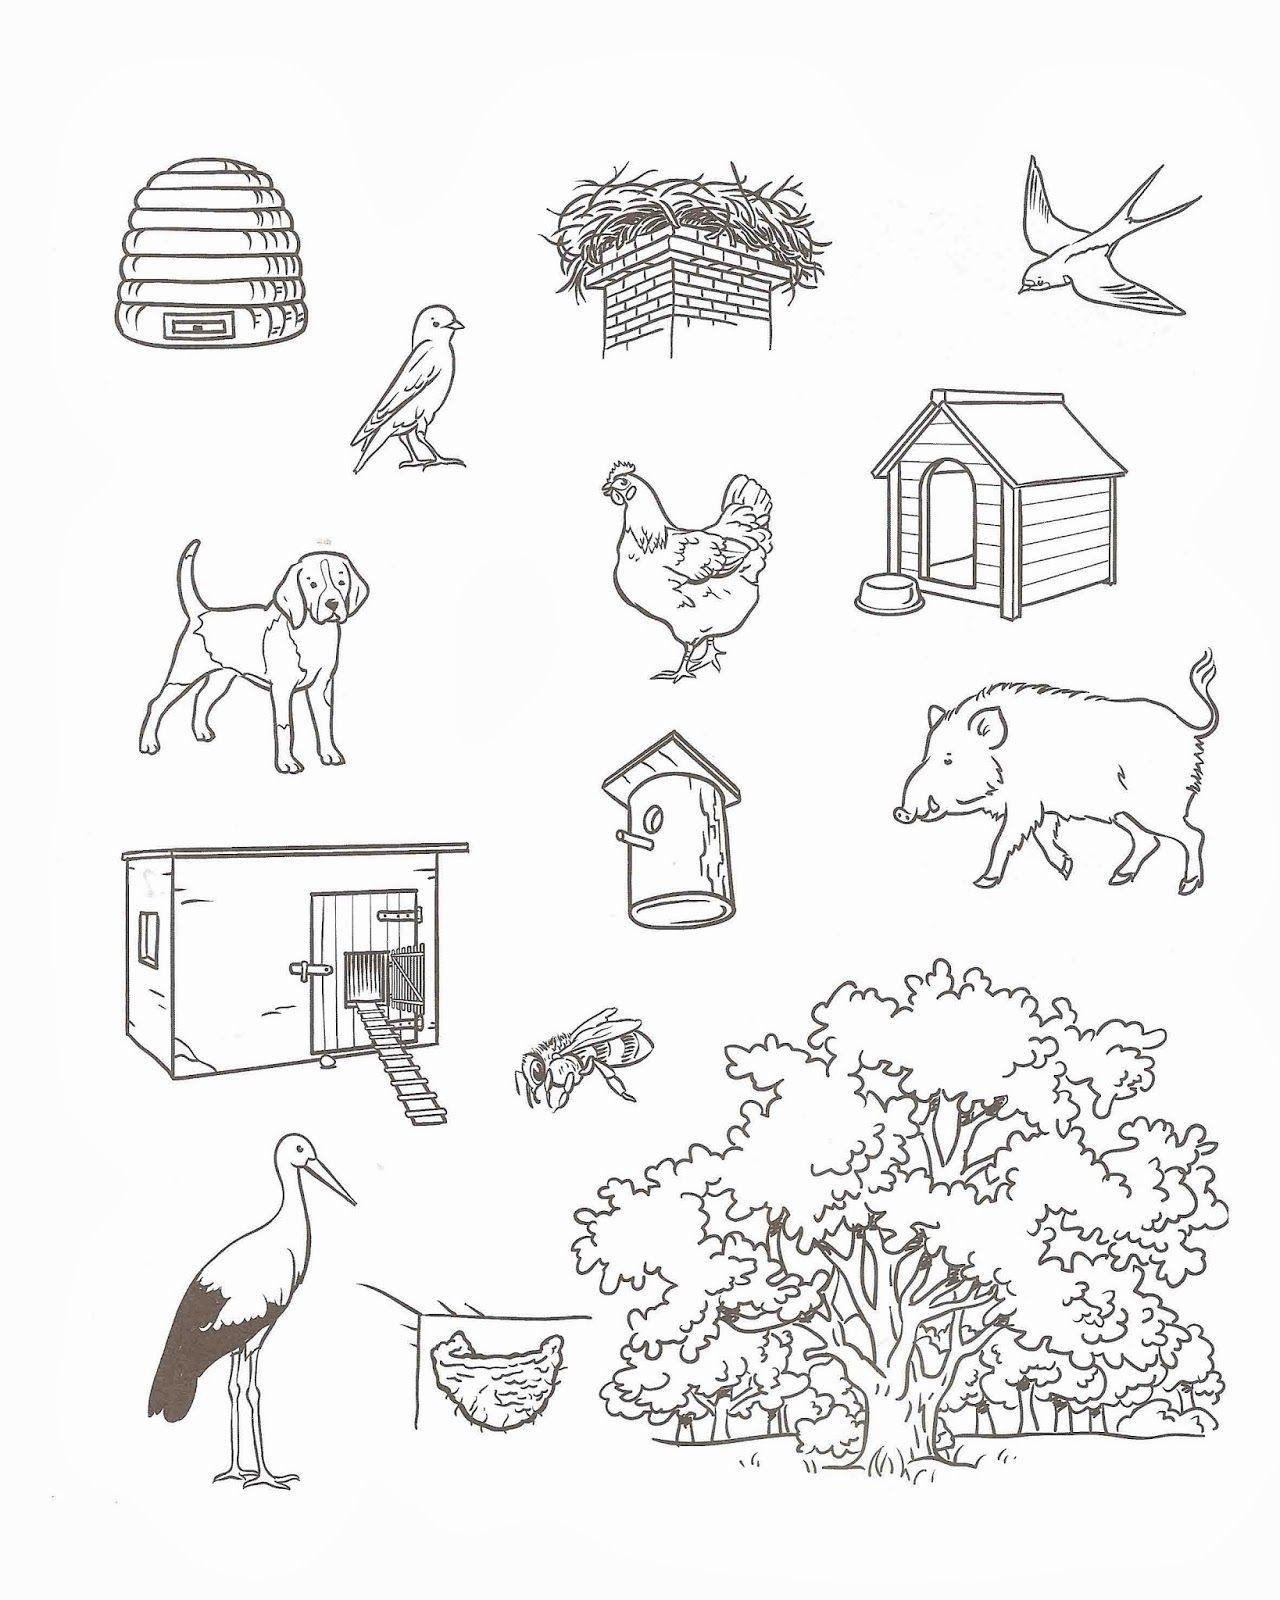 Animal Habitat Worksheet For Kindergarten Worksheet For Kindergarten Animal Habitats Animal Worksheets Kindergarten Worksheets [ 1600 x 1280 Pixel ]